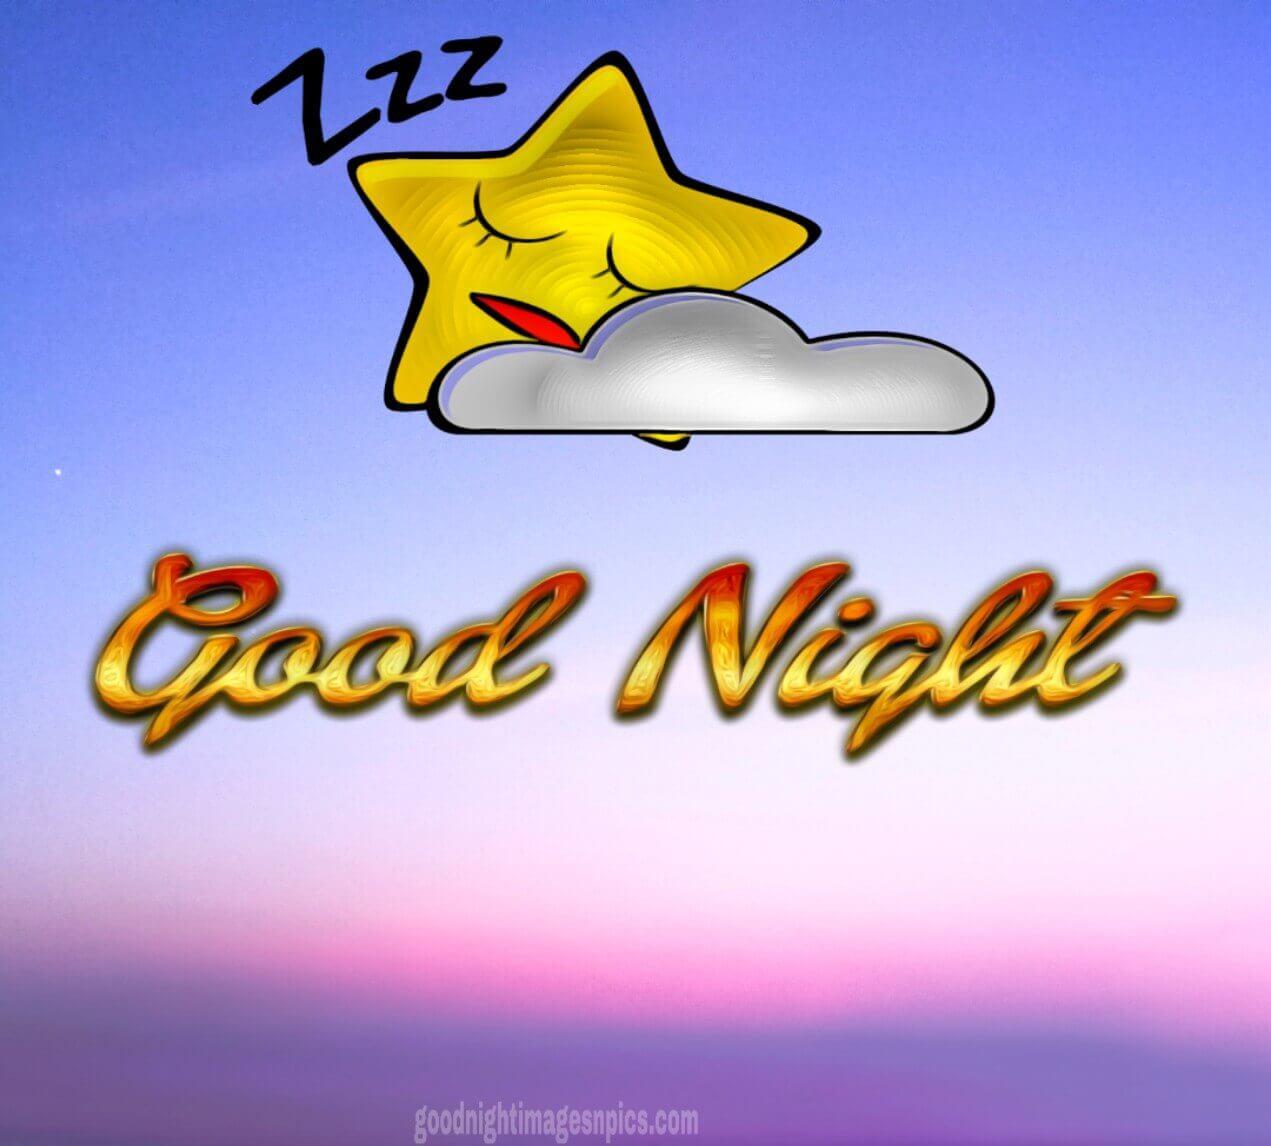 Lovely Image On good Night